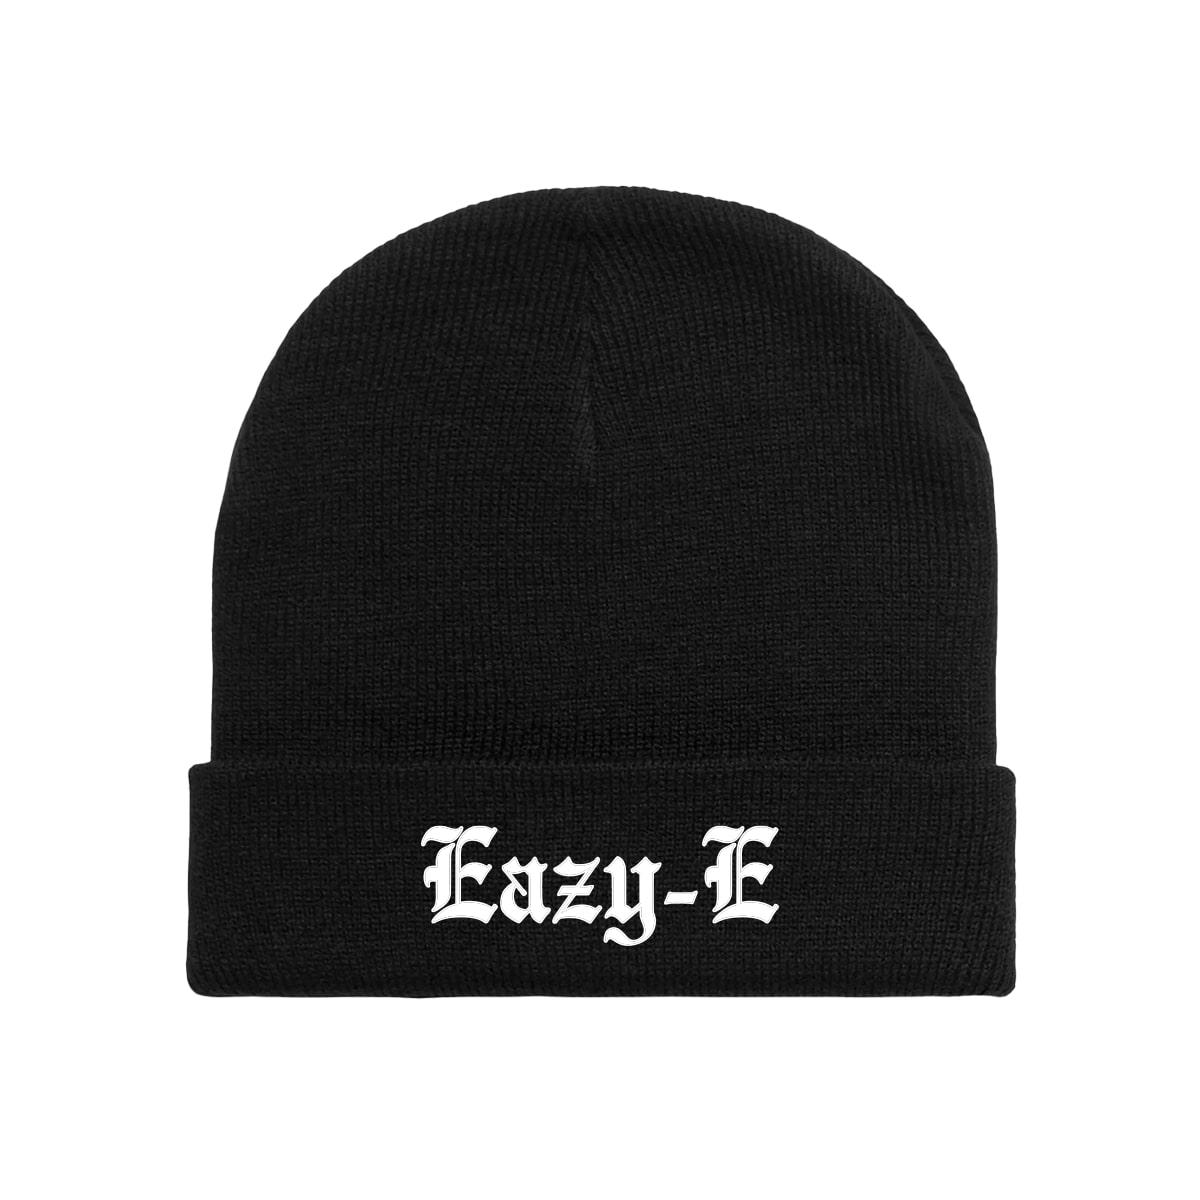 Eazy-E Black Beanie